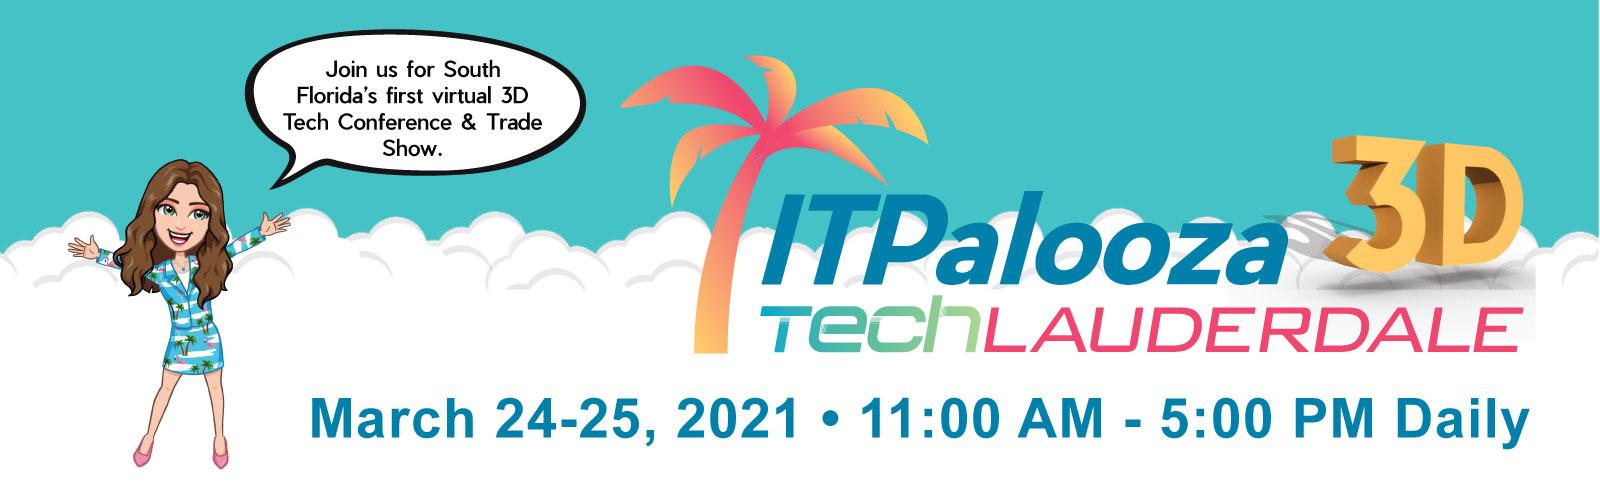 ITP3D-Web-Banner